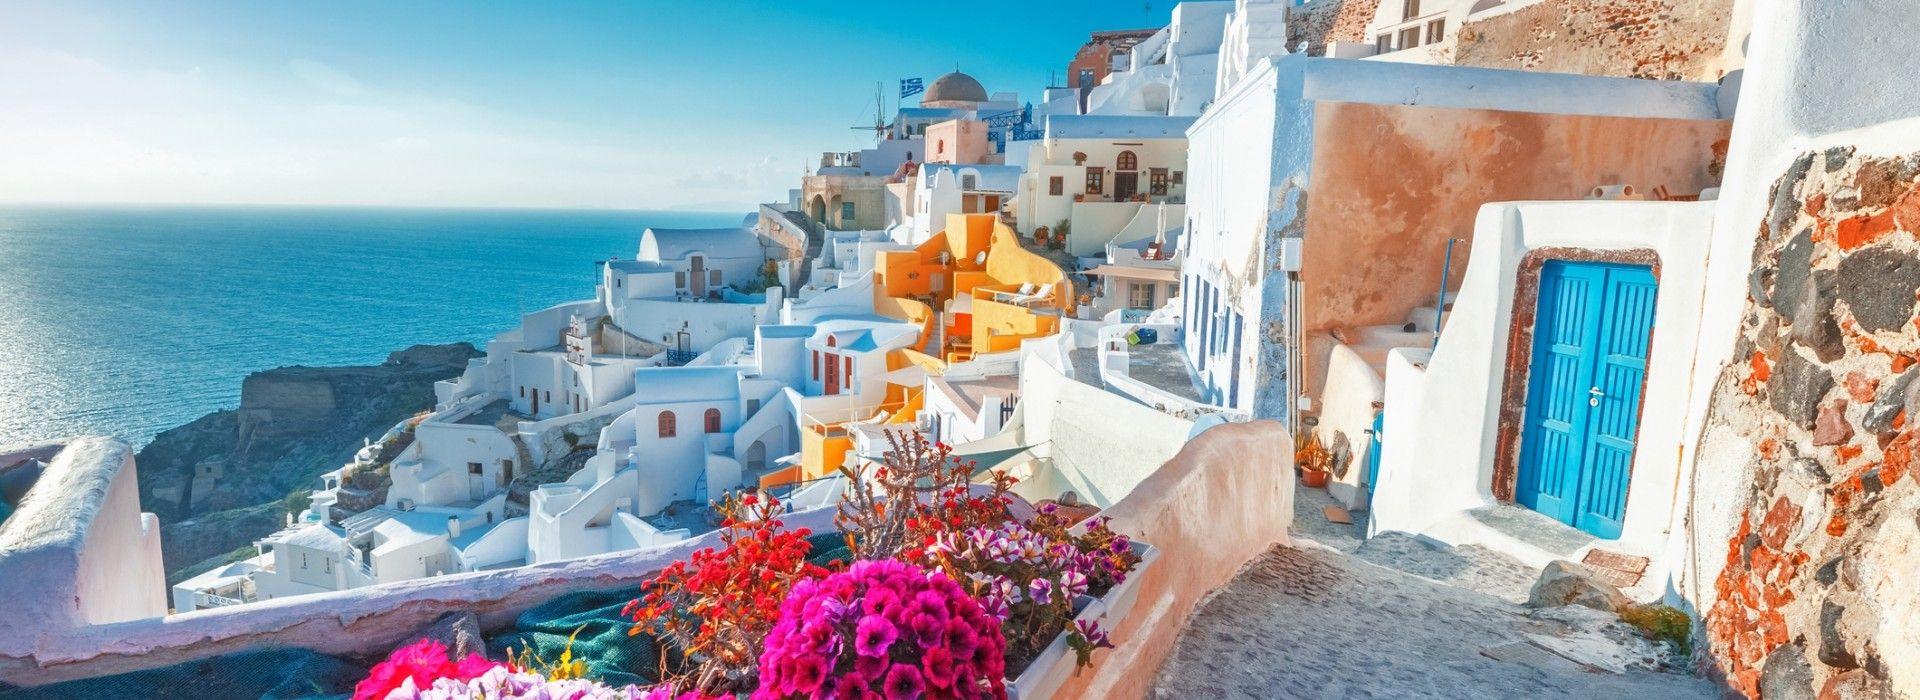 National parks Tours in Mediterranean